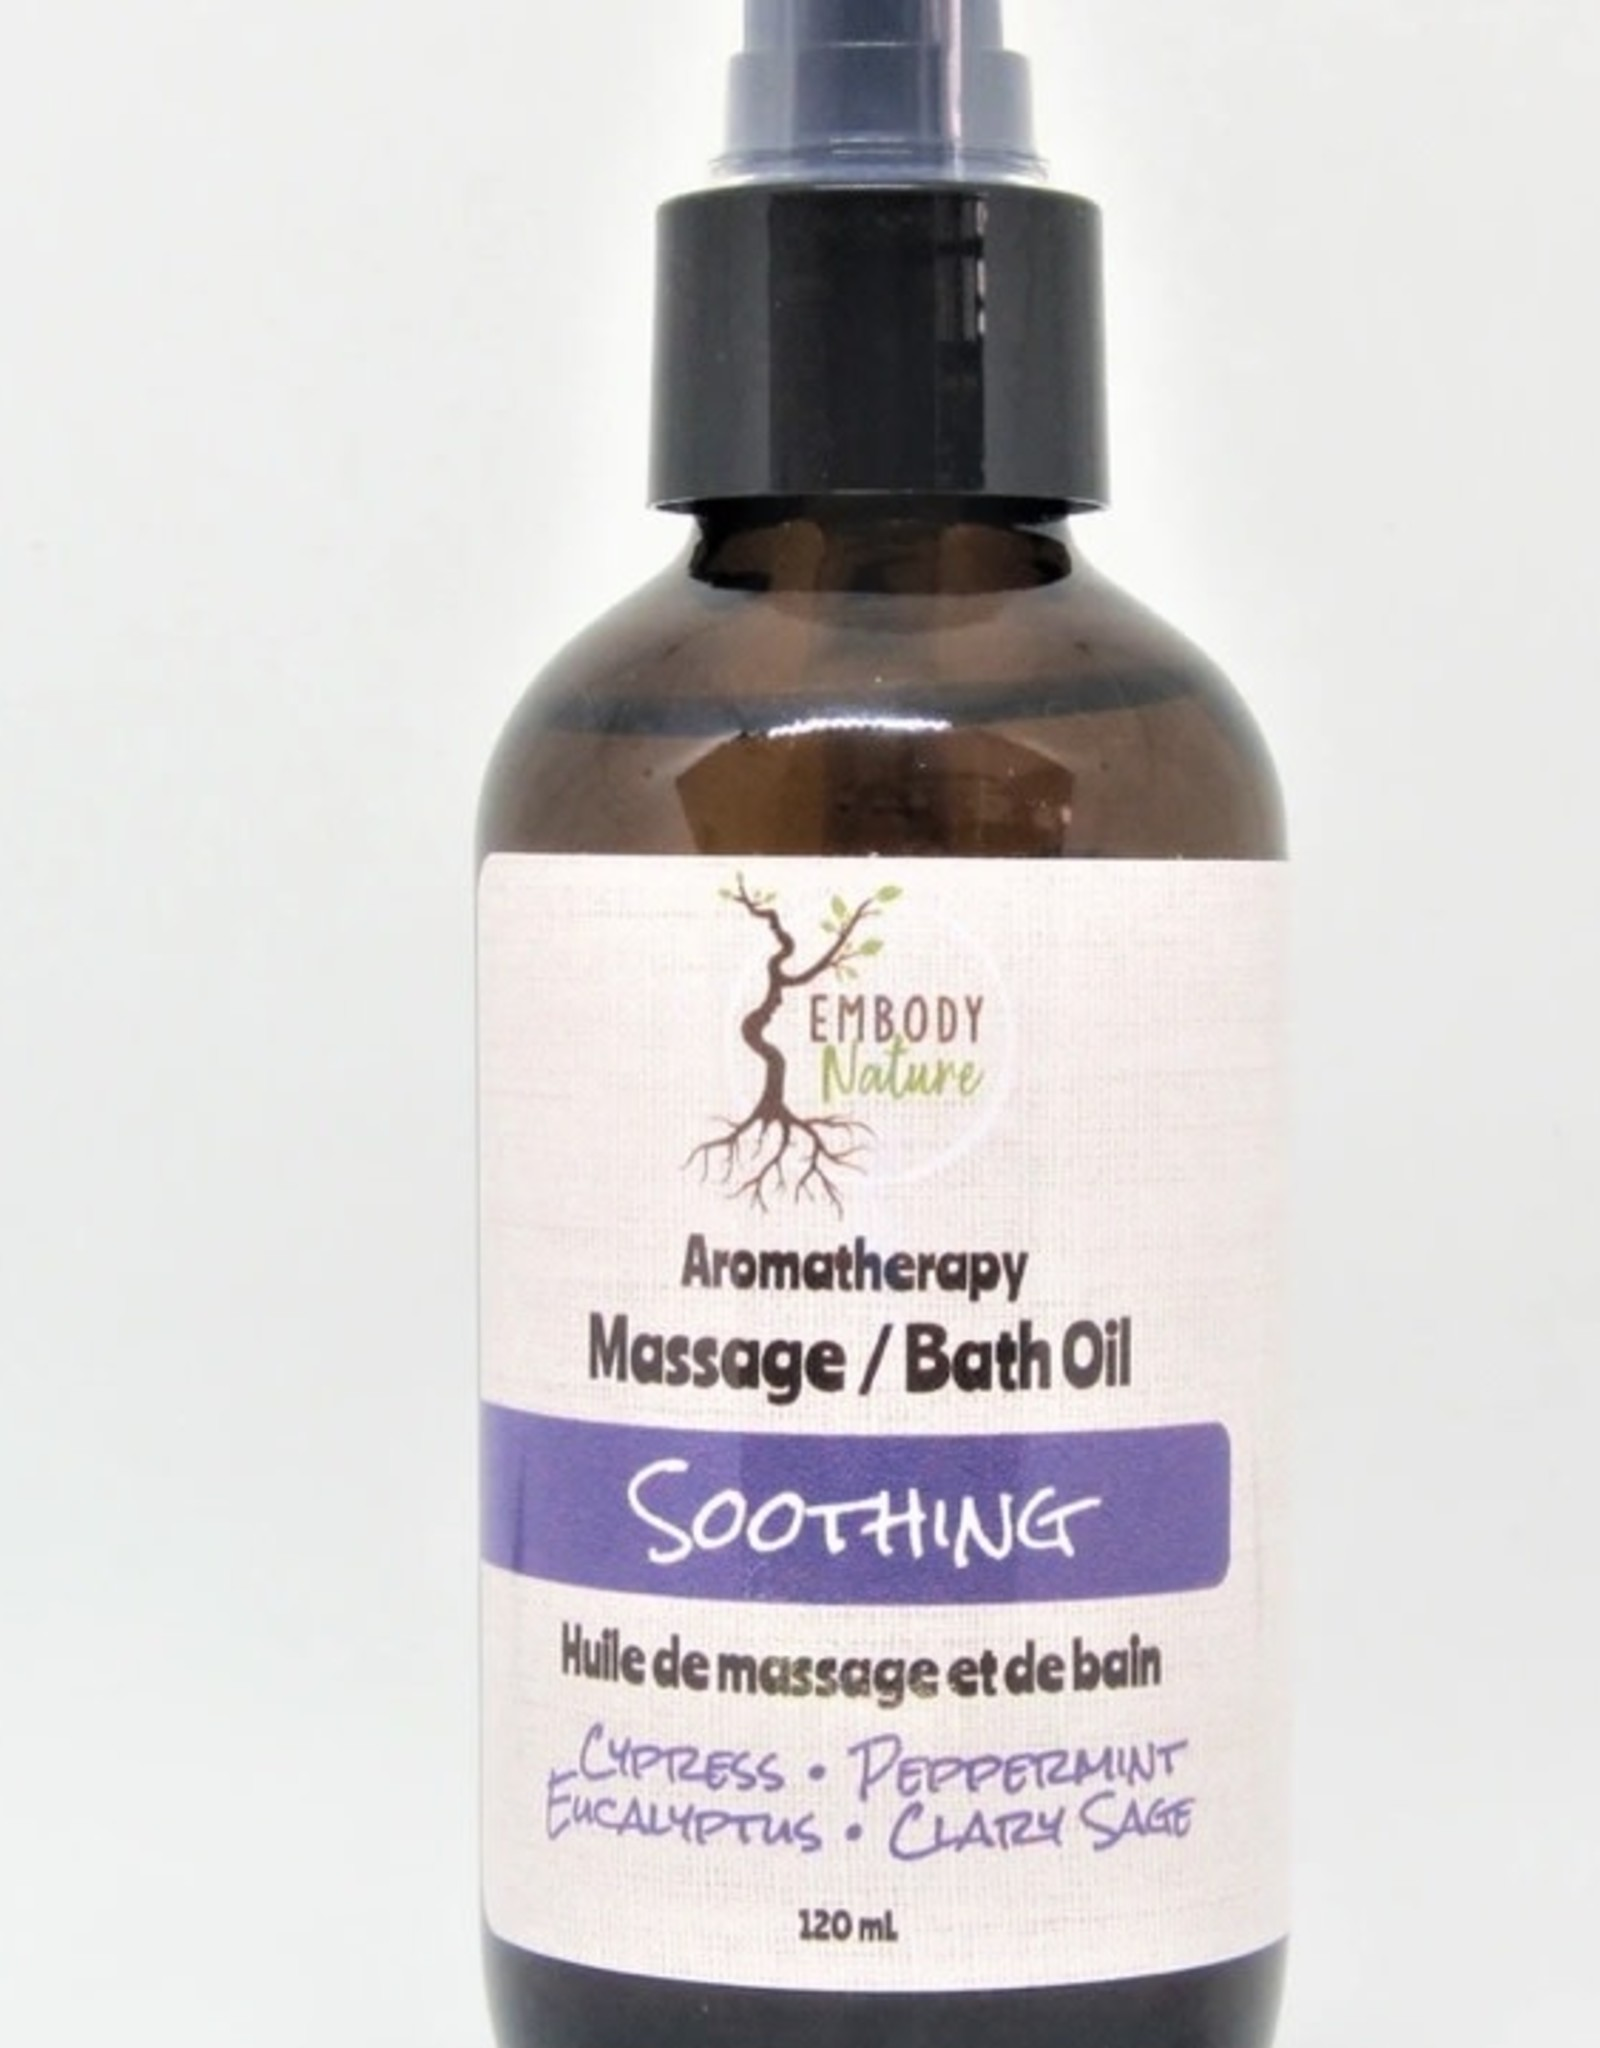 Embody Nature Bath, Body & Massage Oil